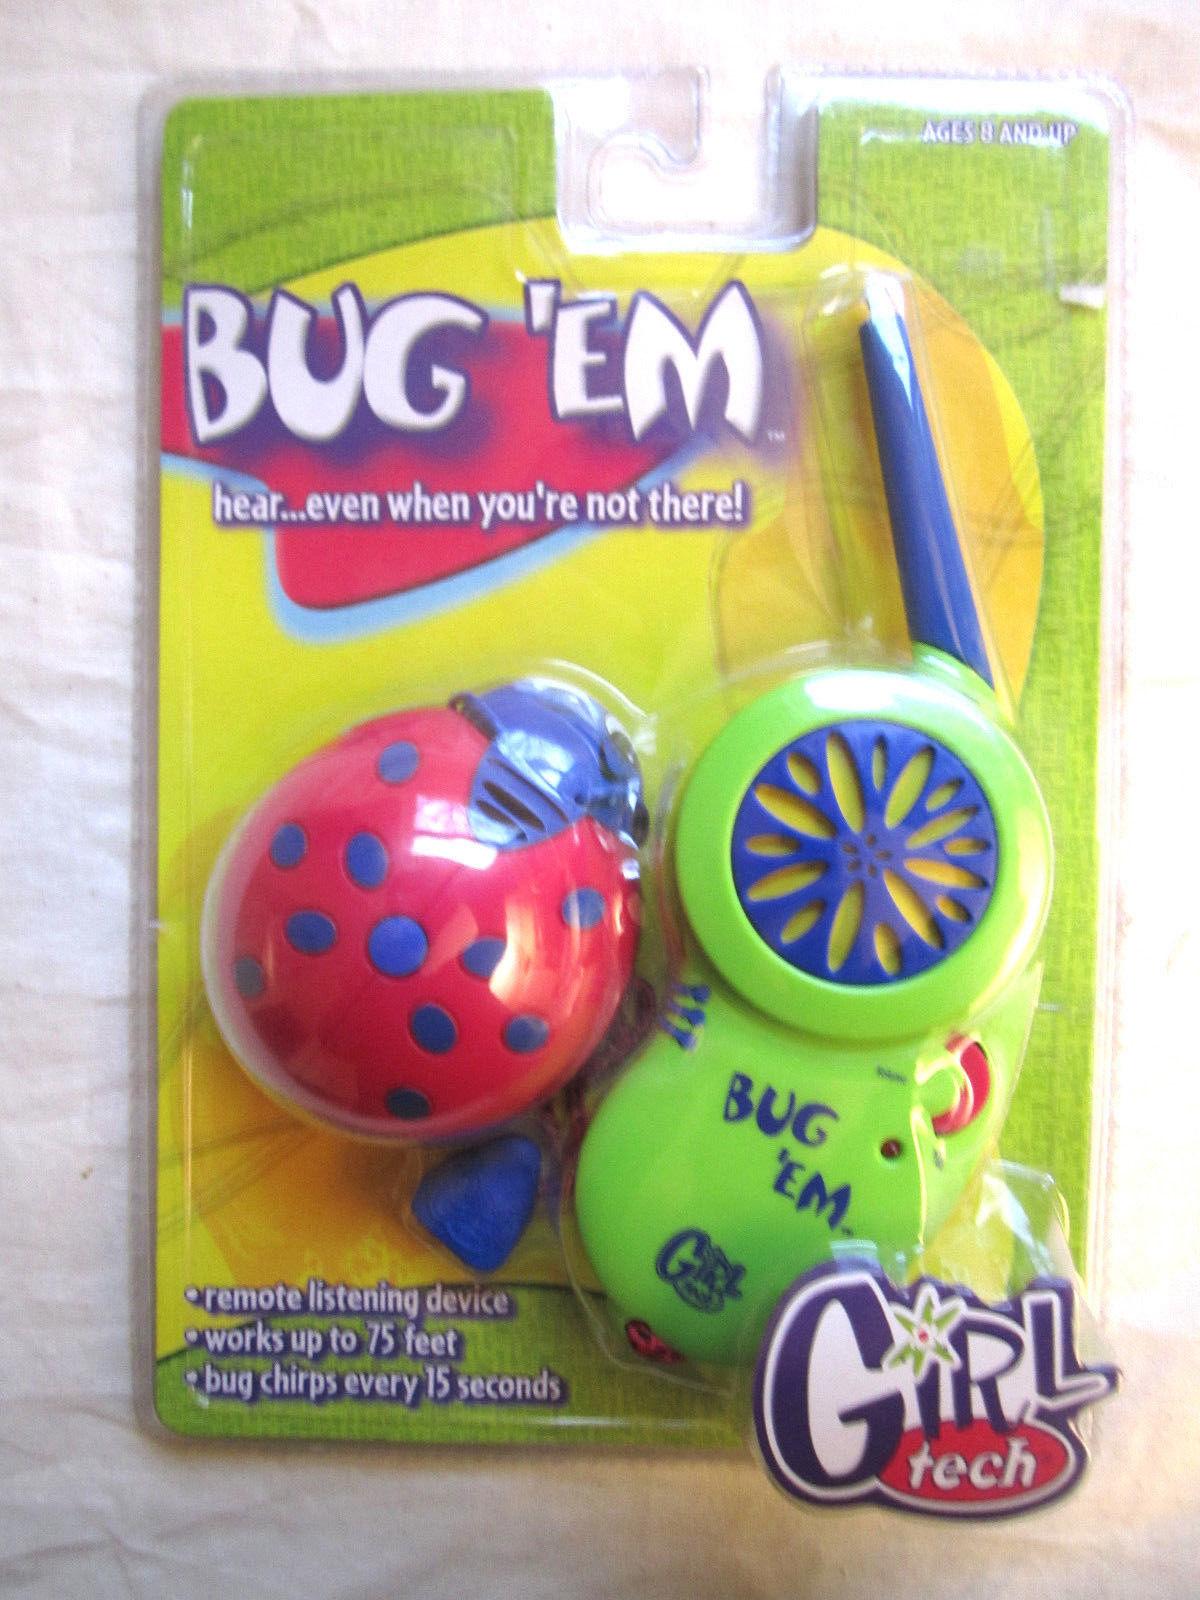 Vintage 1998 Radica Girl Tech Bug Em and 39 similar items